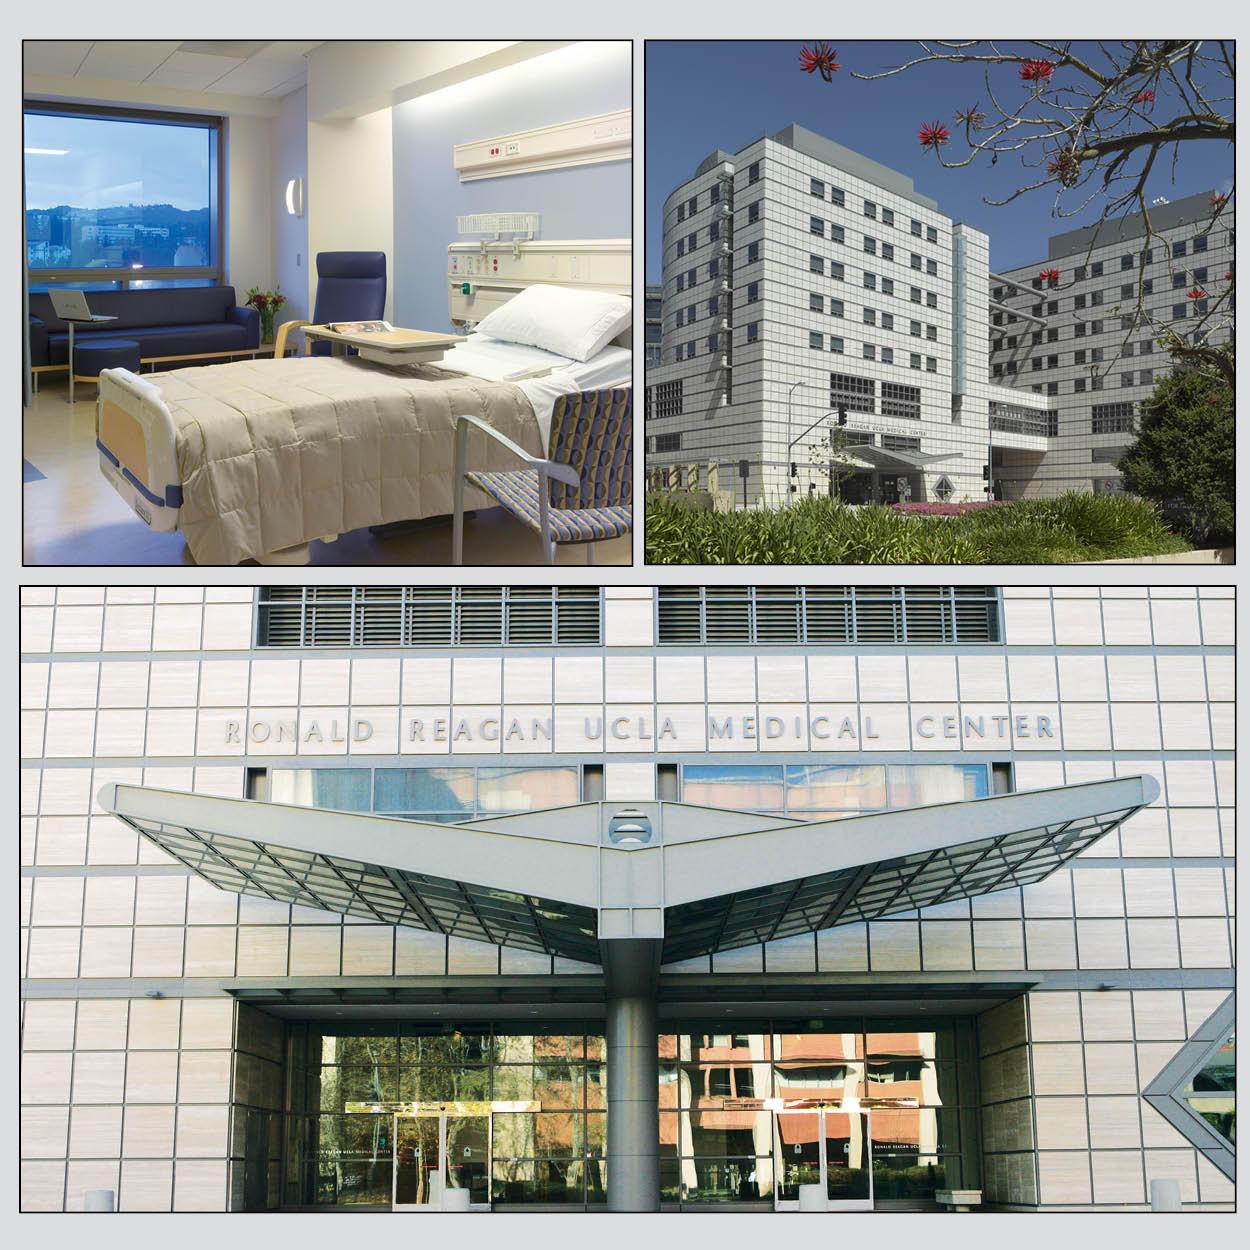 ucla-medical-center-hearts